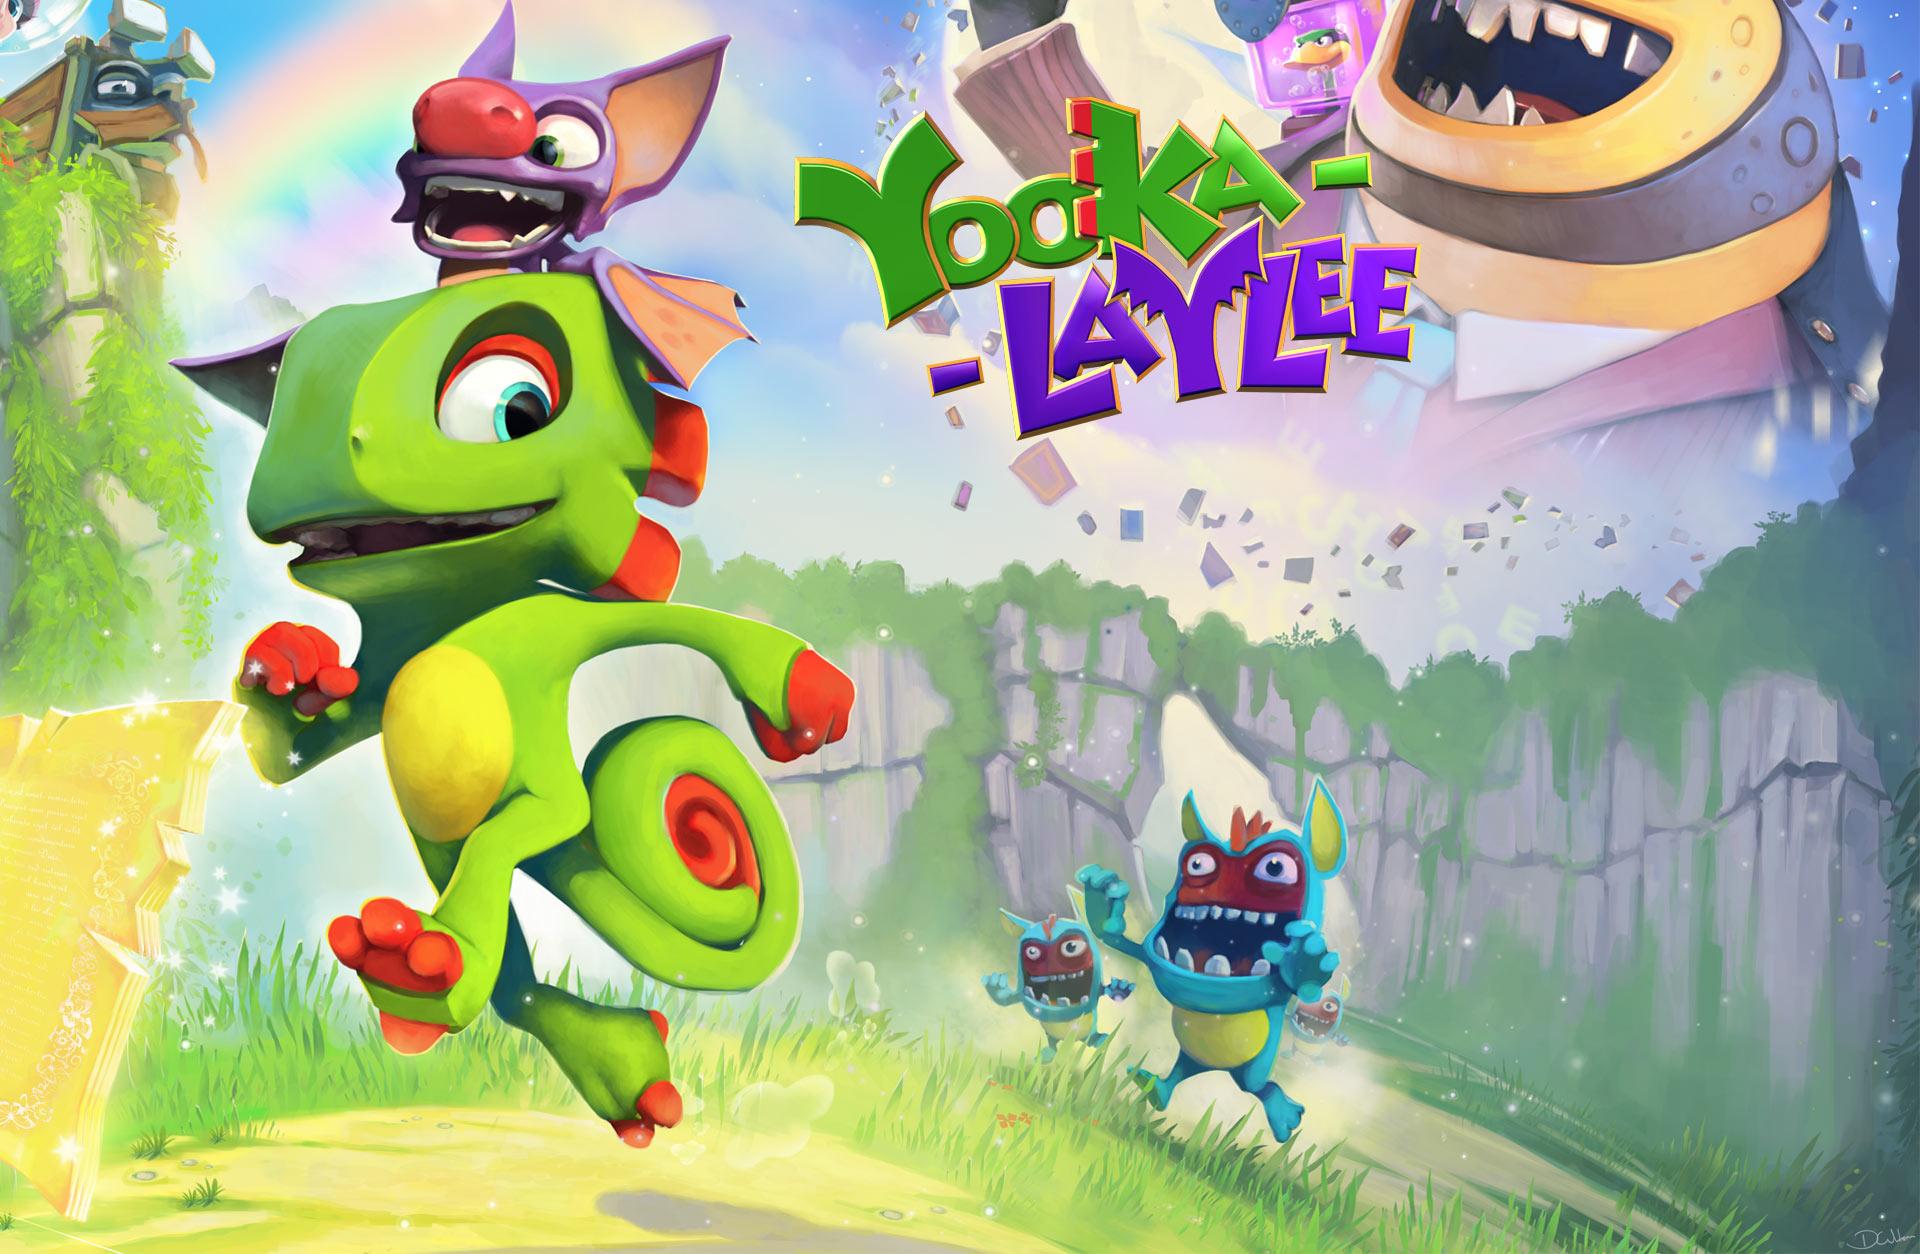 Yooka Laylee [PC-Steam] £8.75 - Razer Game Store